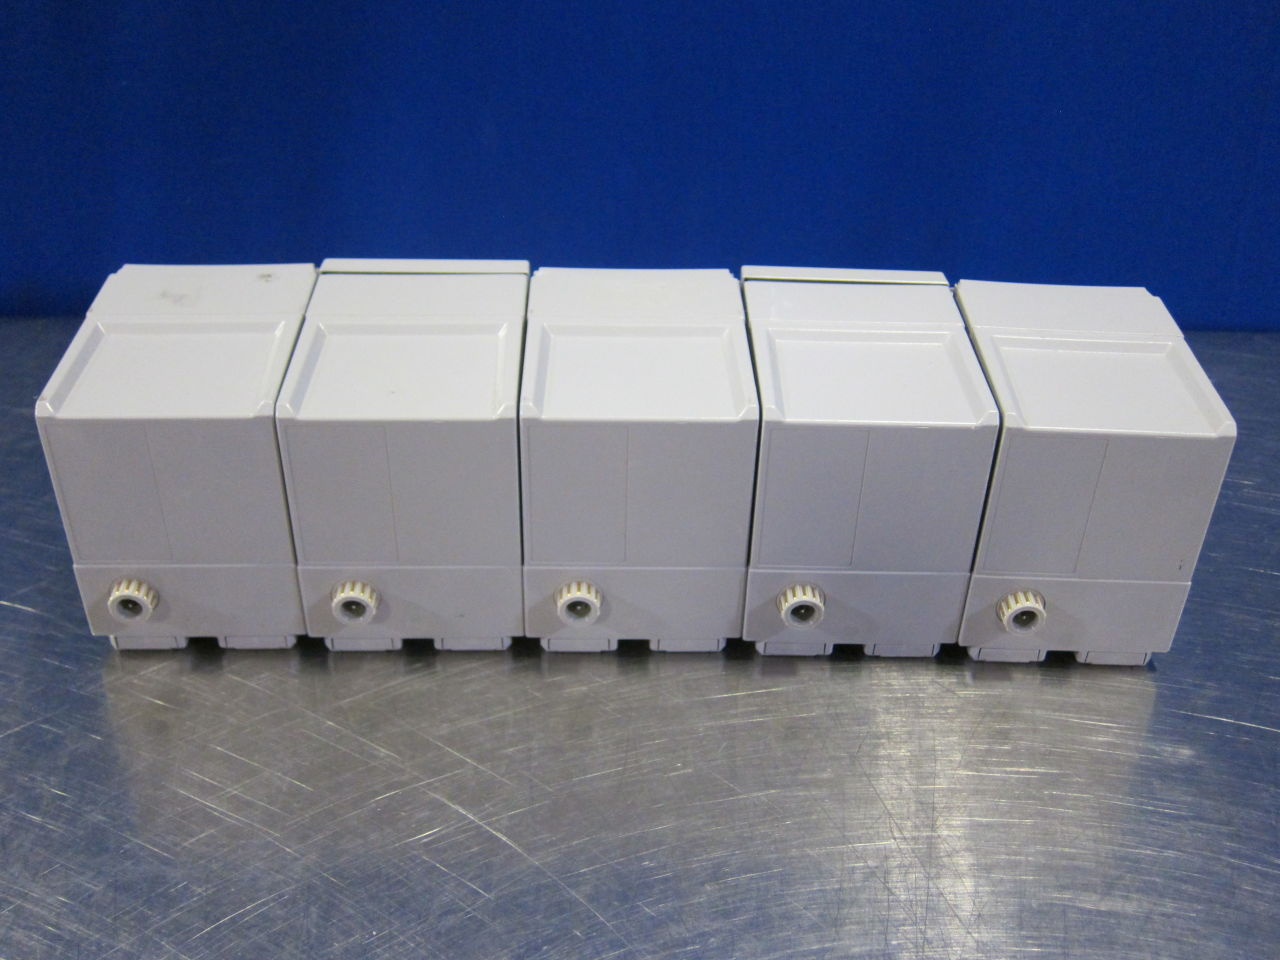 PHILIPS M1116B  - Lot of 11 Module